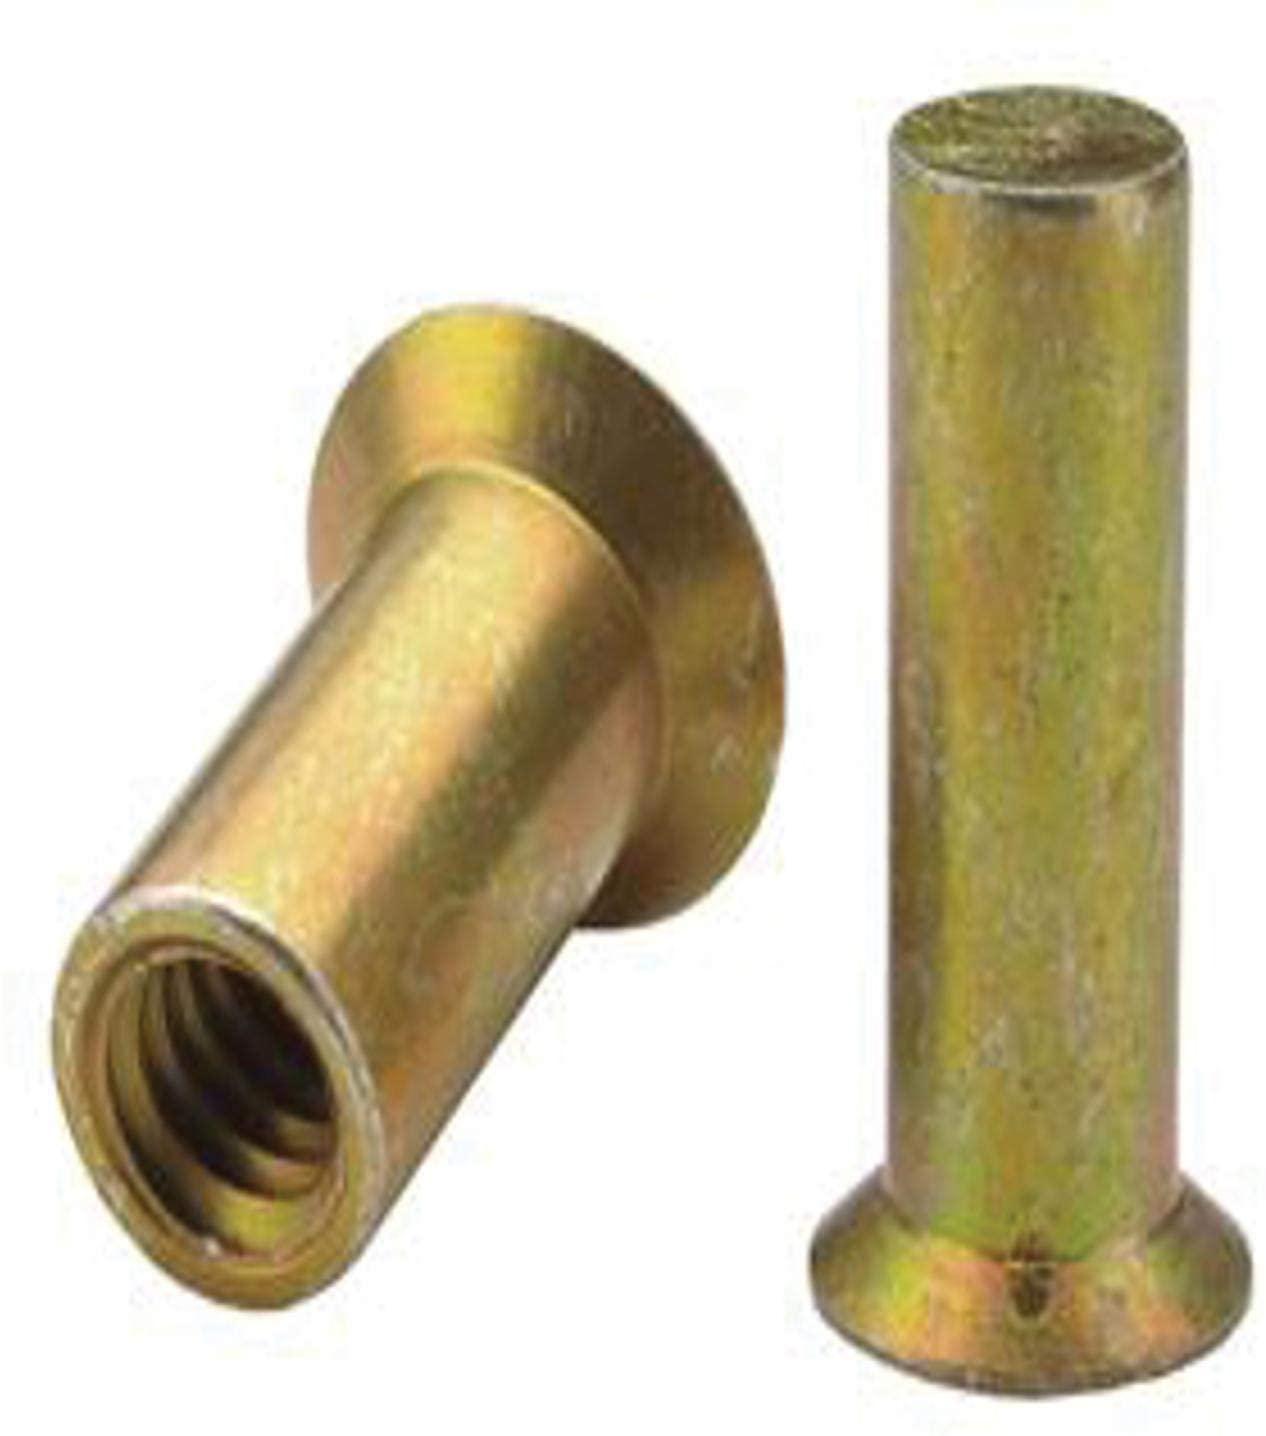 AESM5B5.1, RIVETNUT, M5x0.8 (3.60-5.10mm GR) RND Body, CSK HD, CLSD End, Steel, CAD CLR (5 PK)